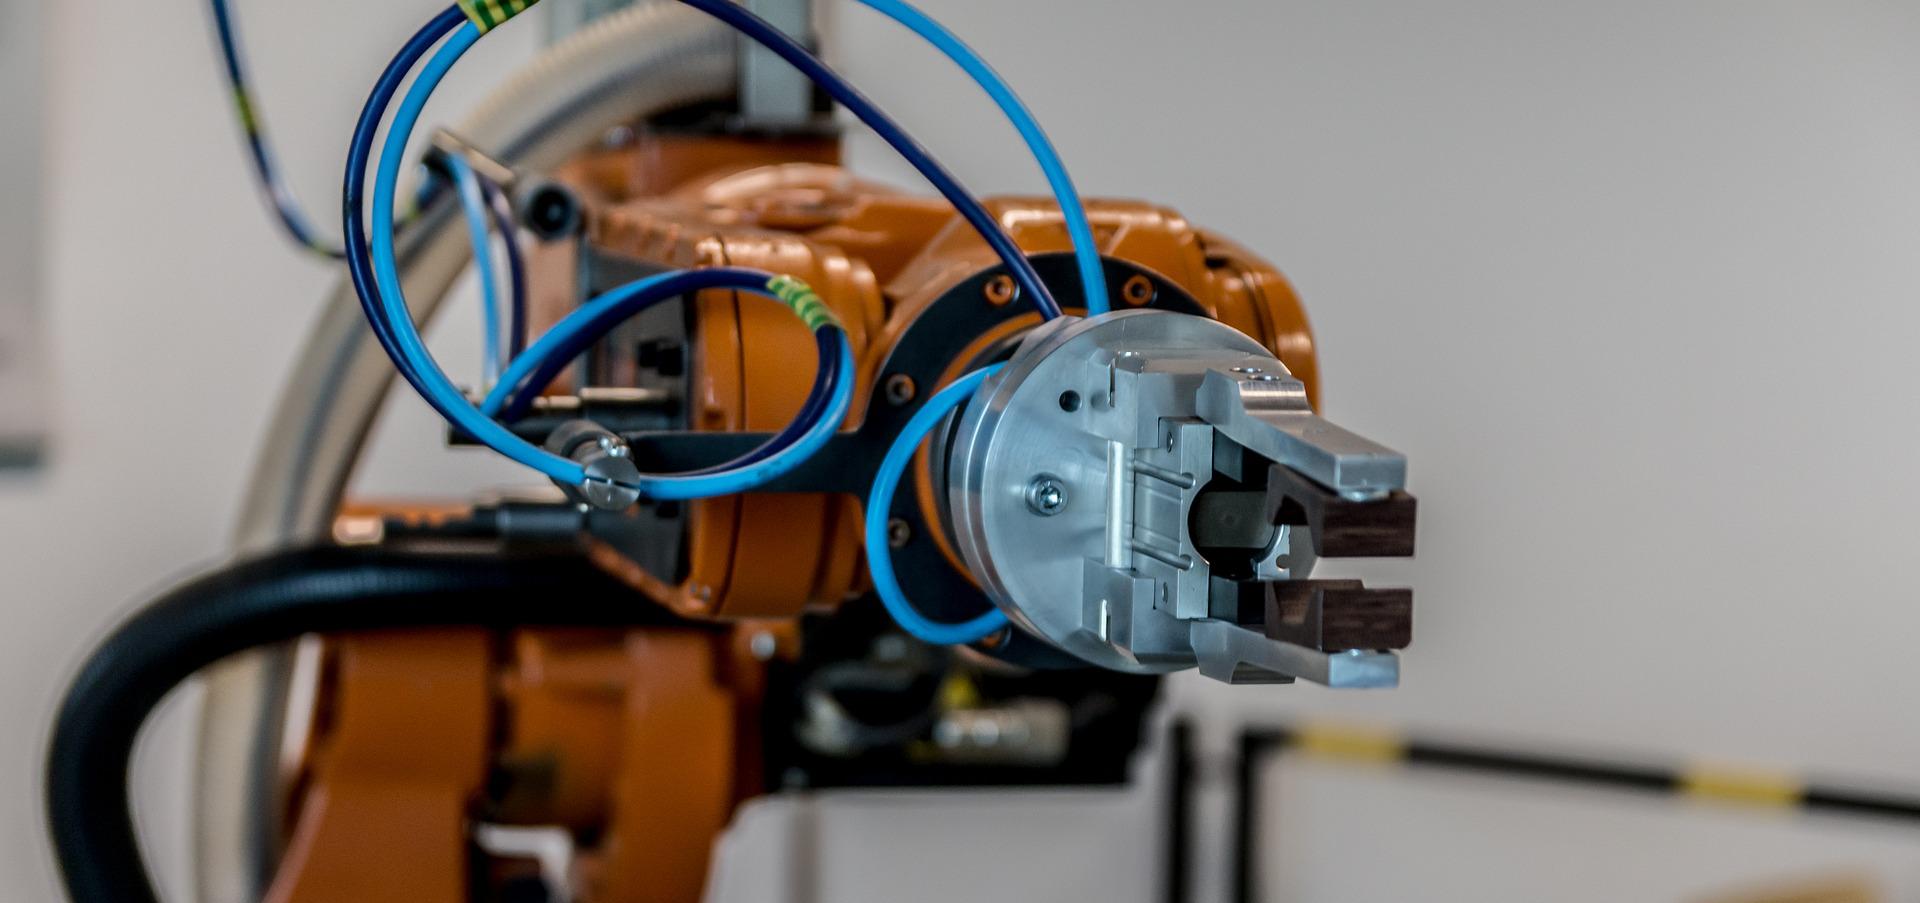 mimik smart manufacturing